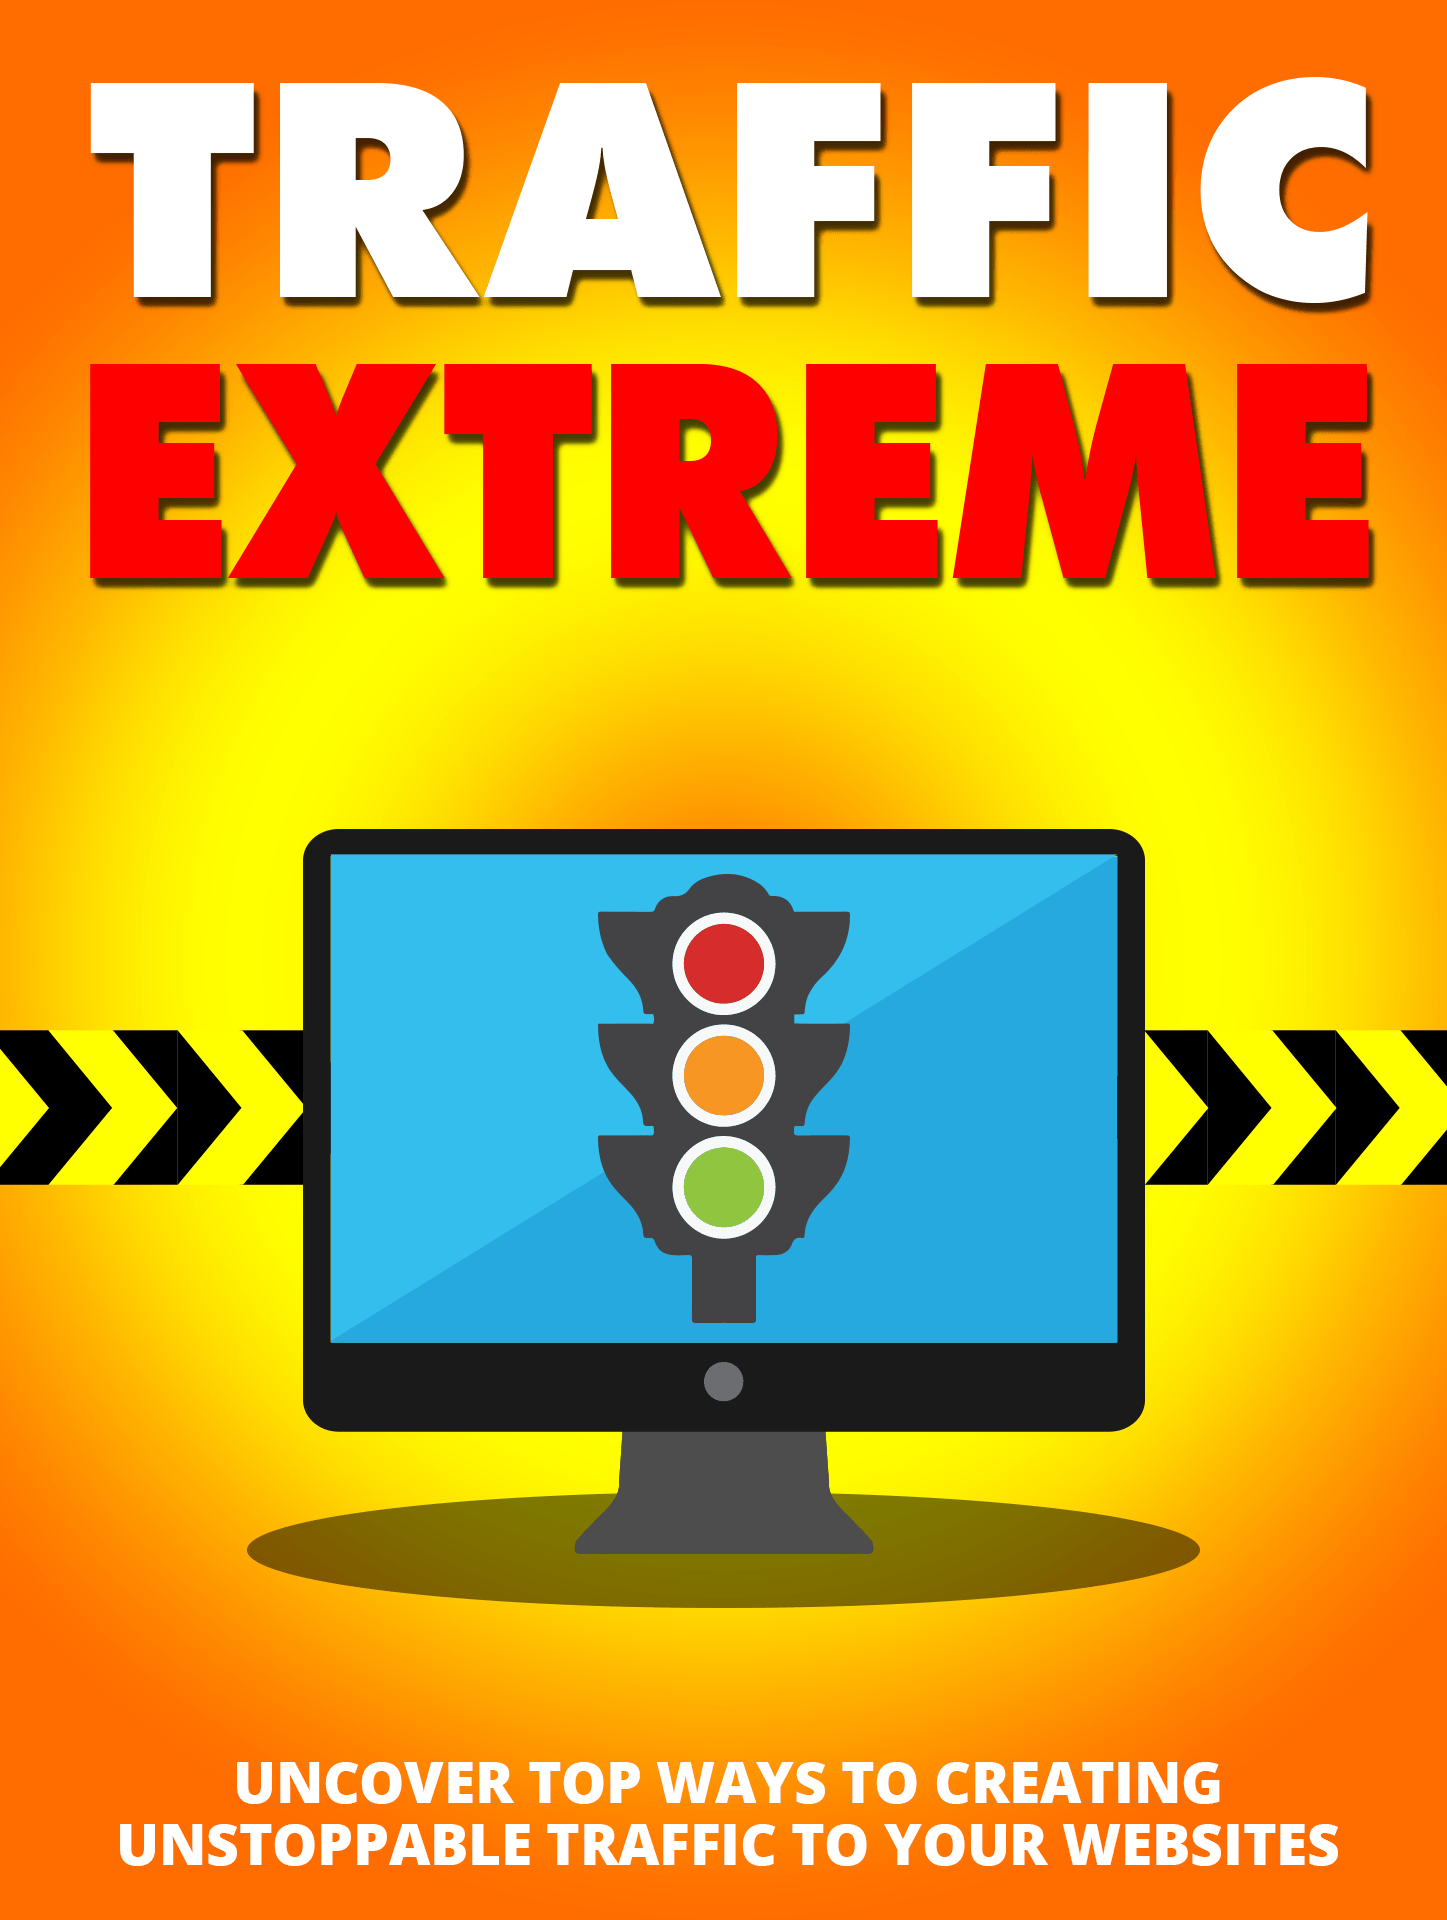 Traffic-Extreme